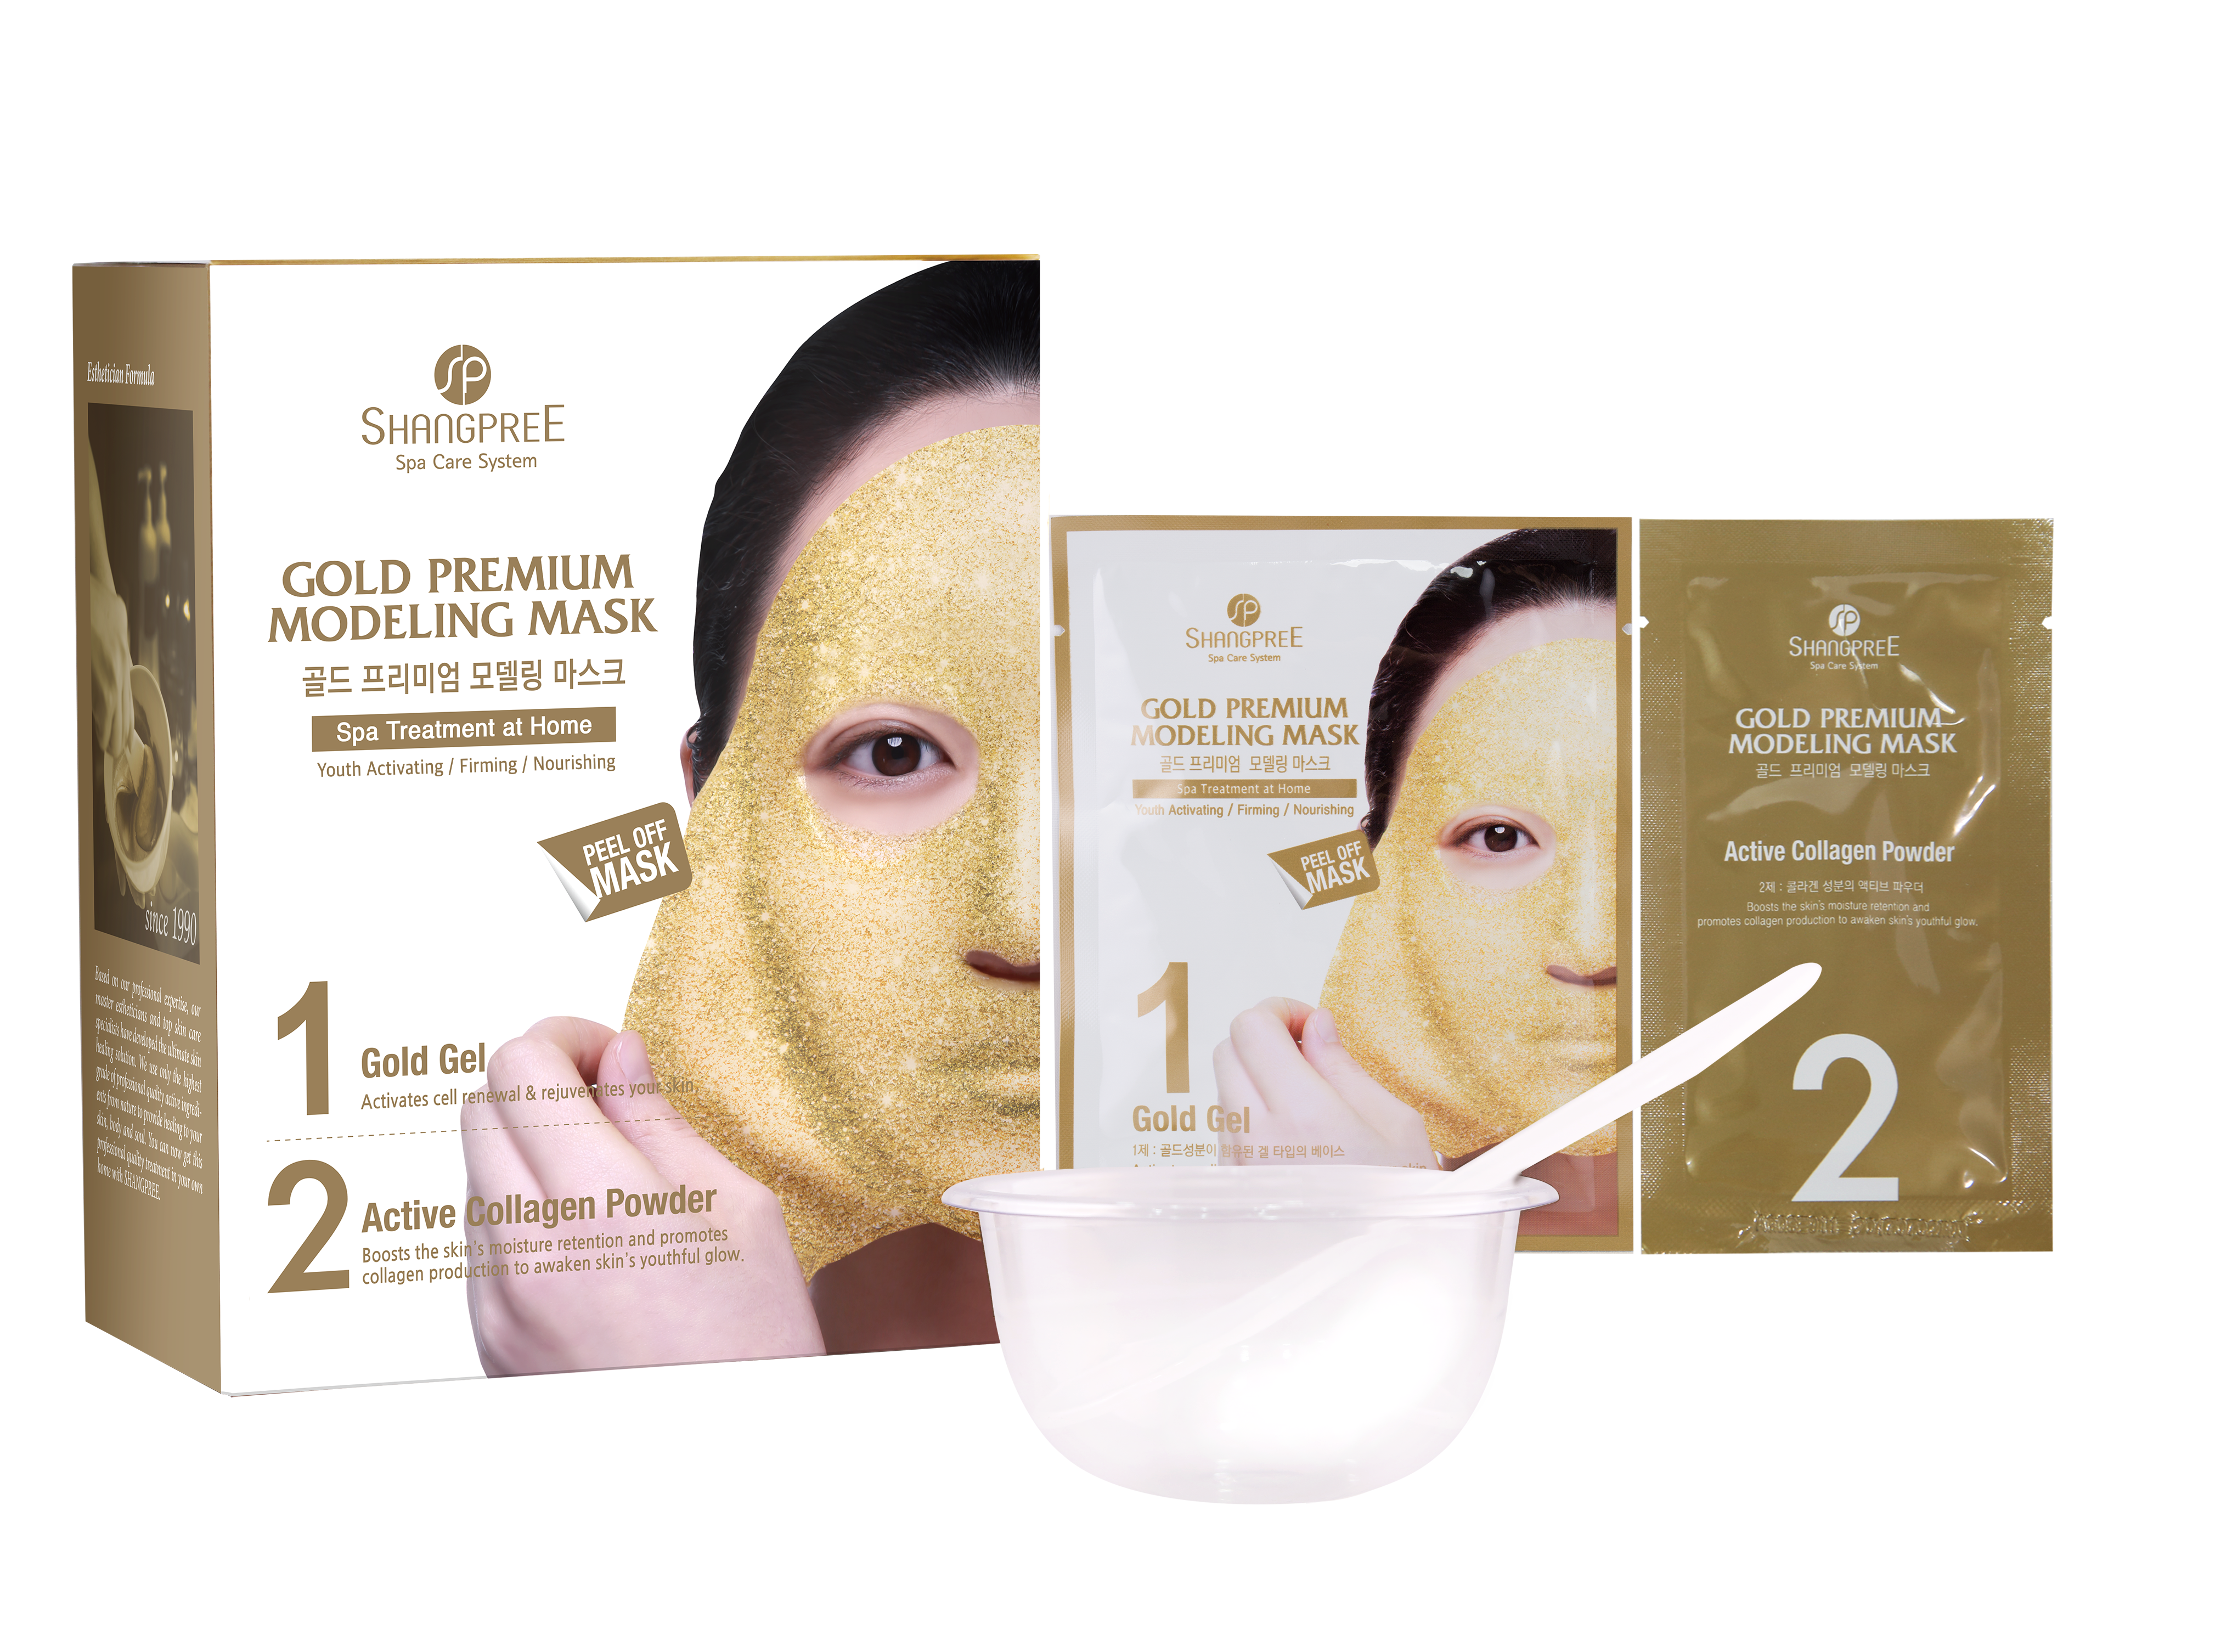 Shangpree; Gold Premium Modeling Mask